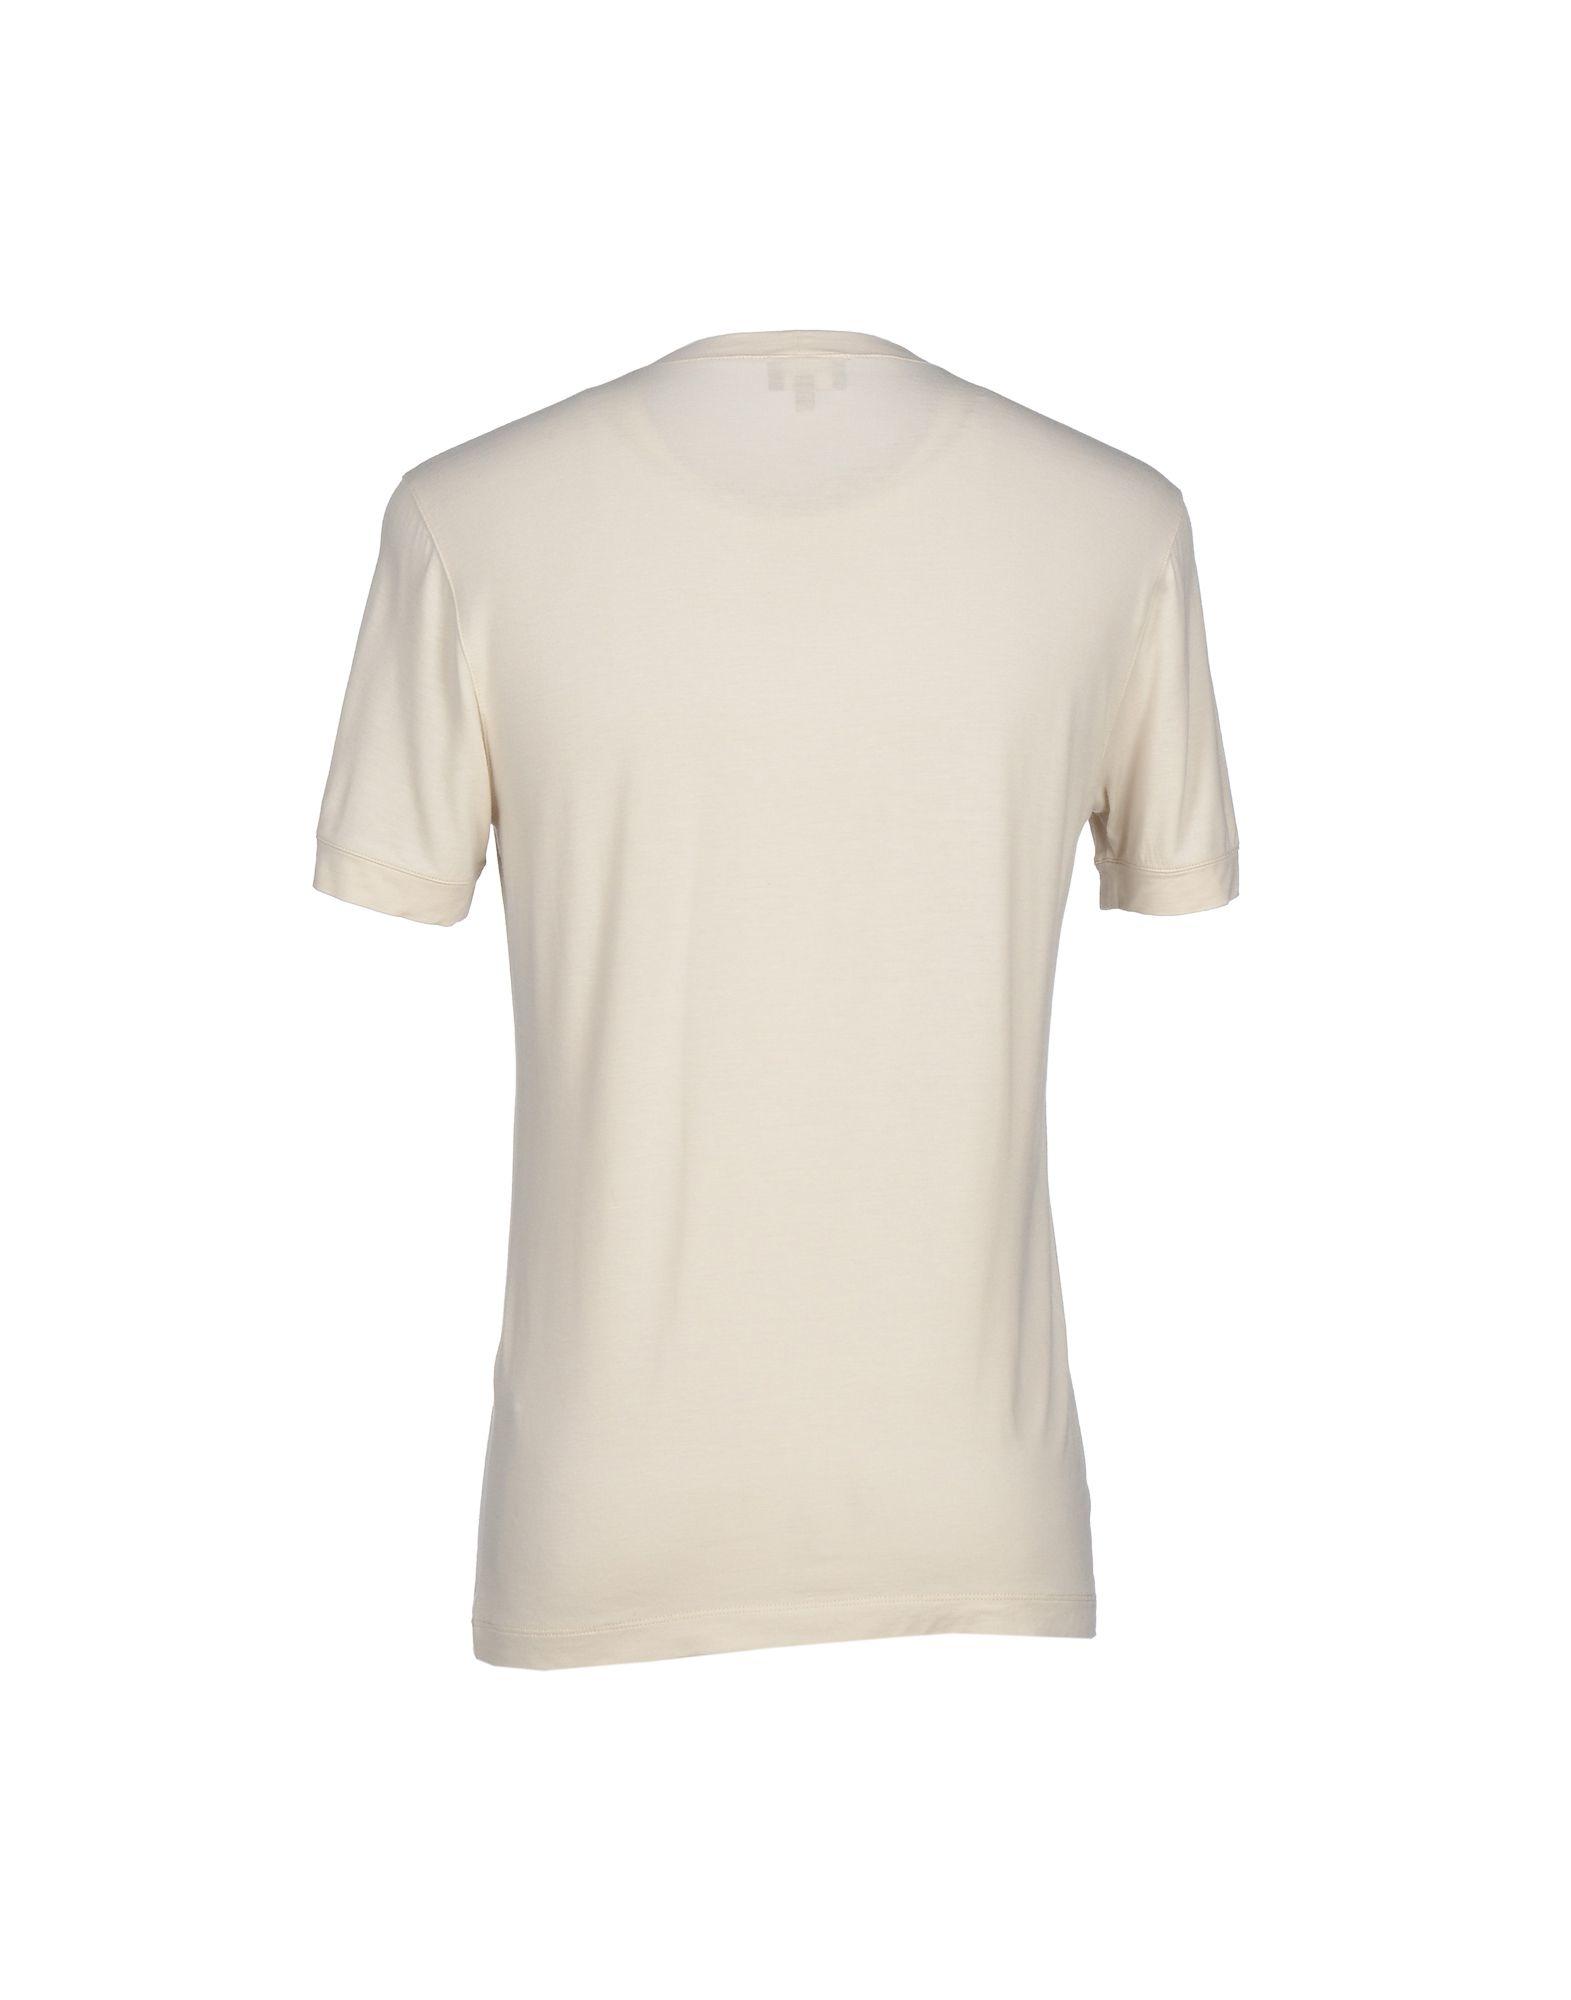 giorgio armani tshirt in natural for men lyst